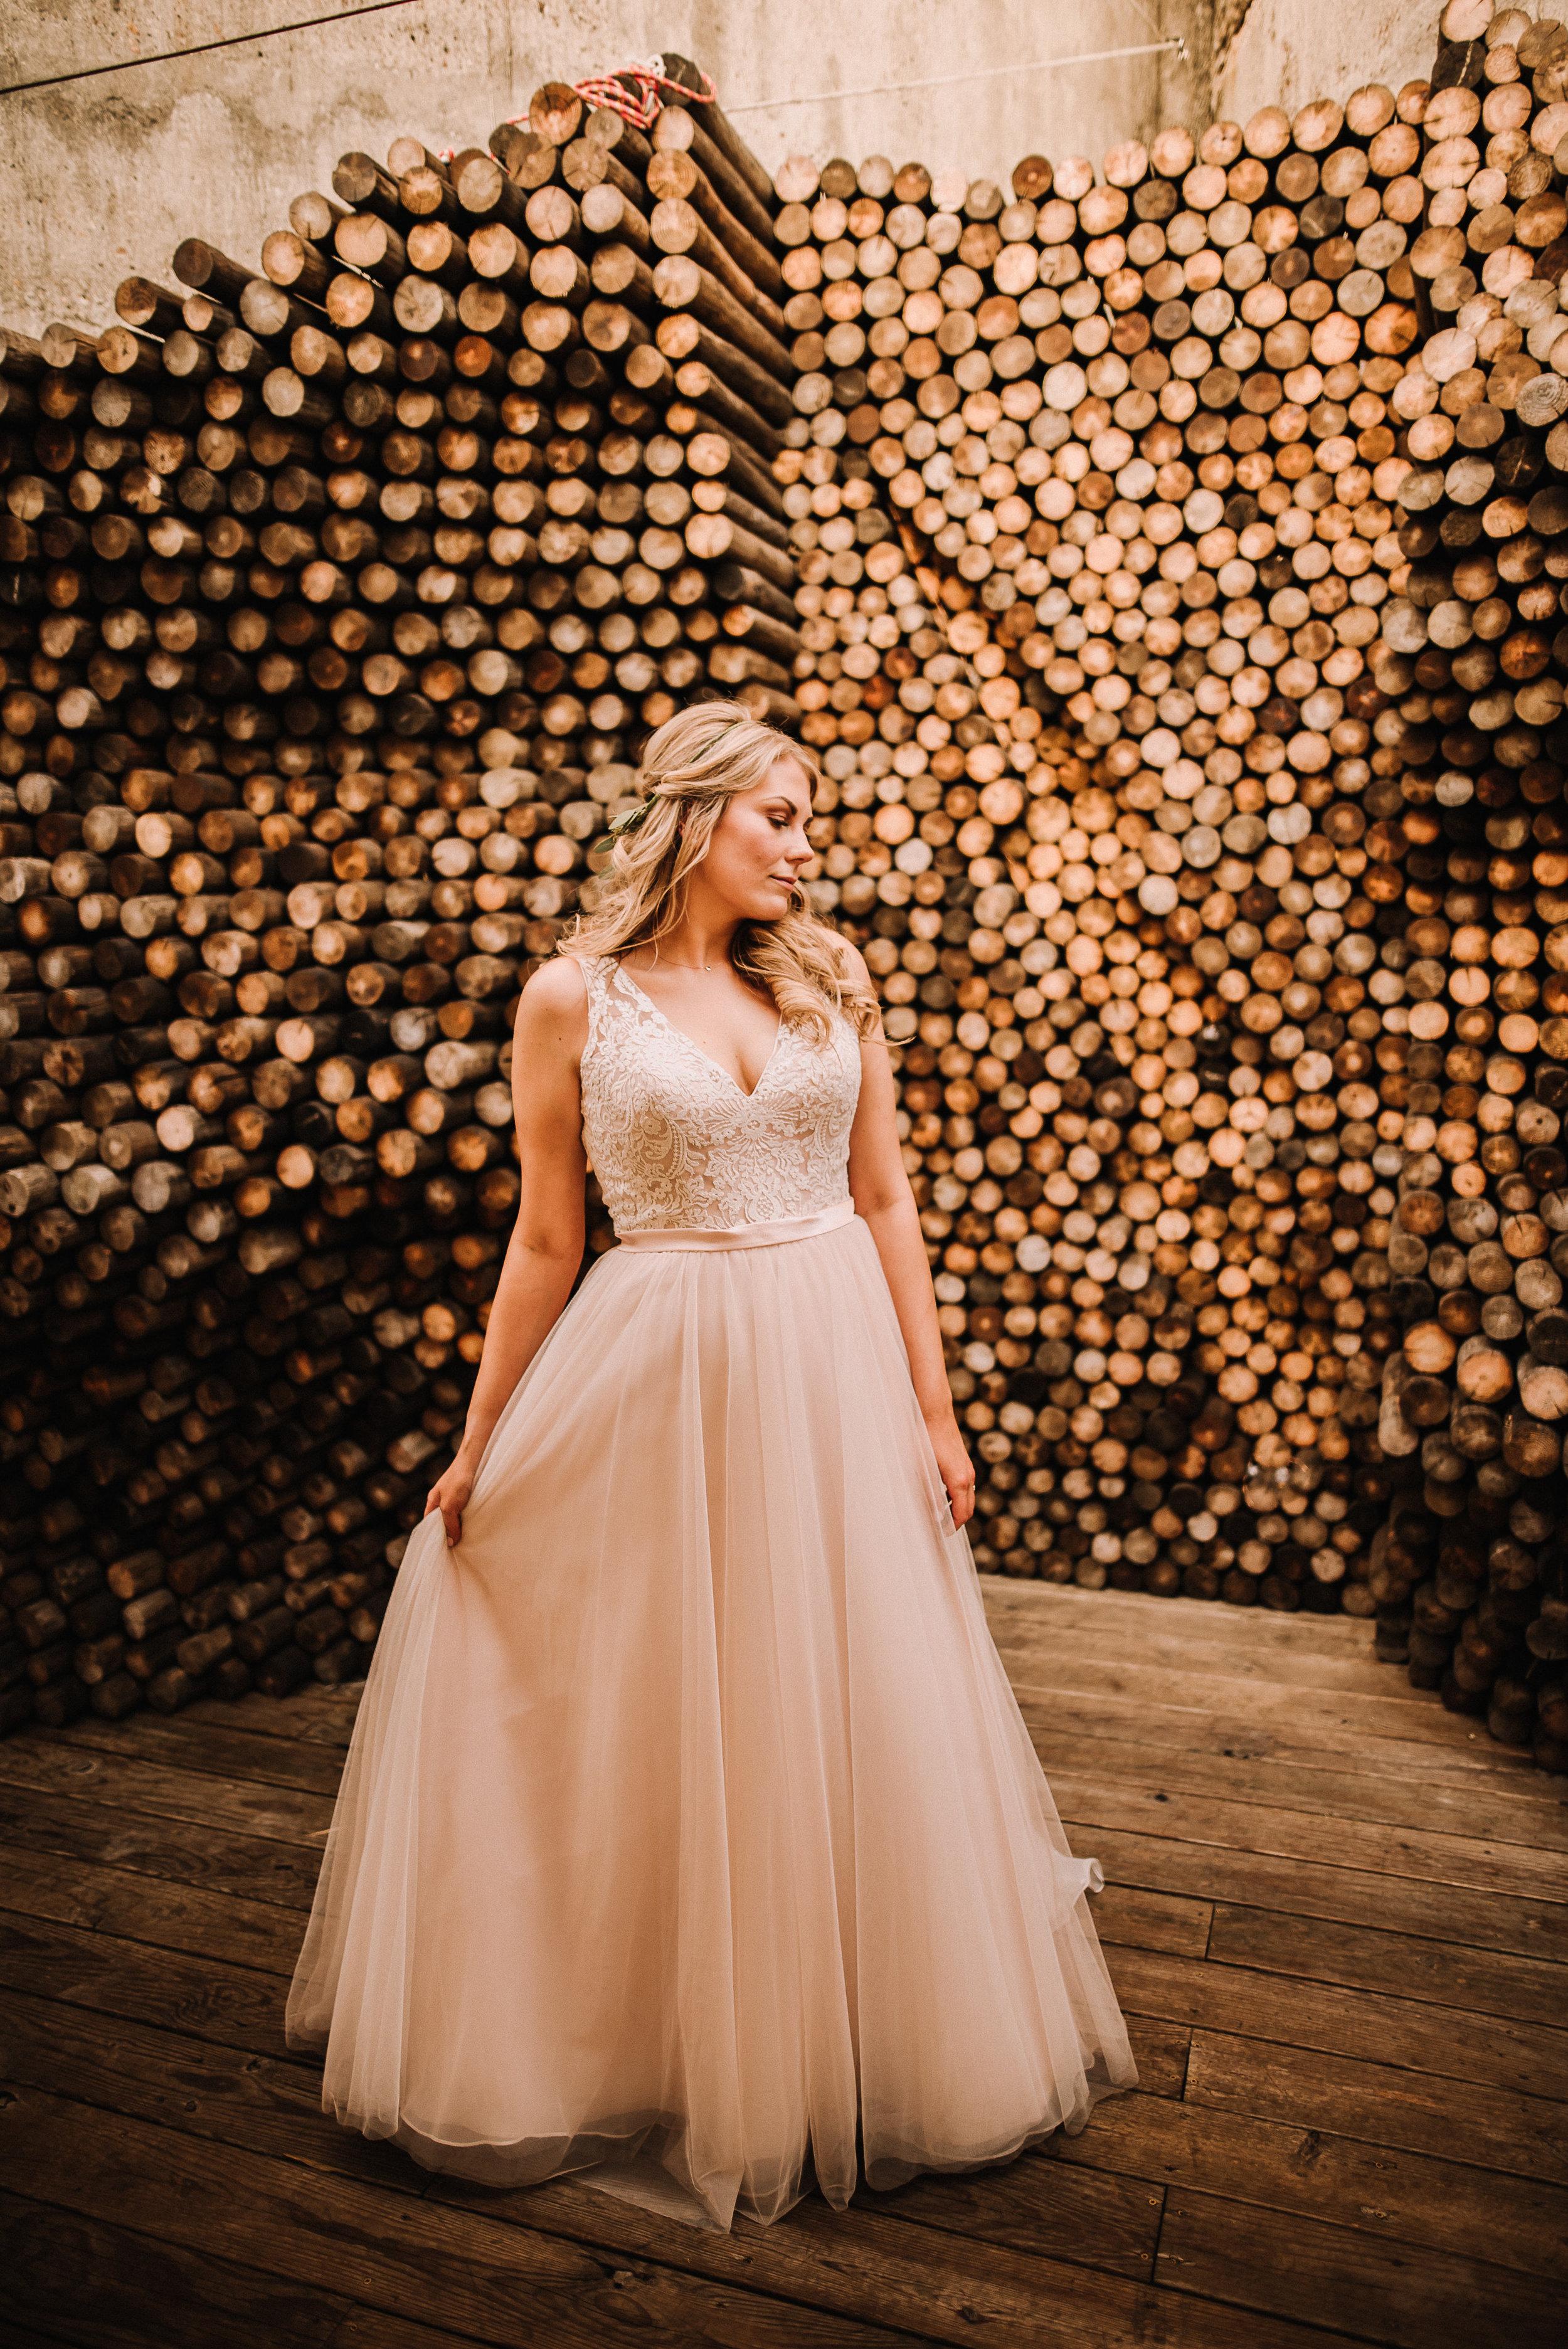 Pearson-Wiseacre-Wedding_Ashley-Benham-Photography (337 of 633).jpg